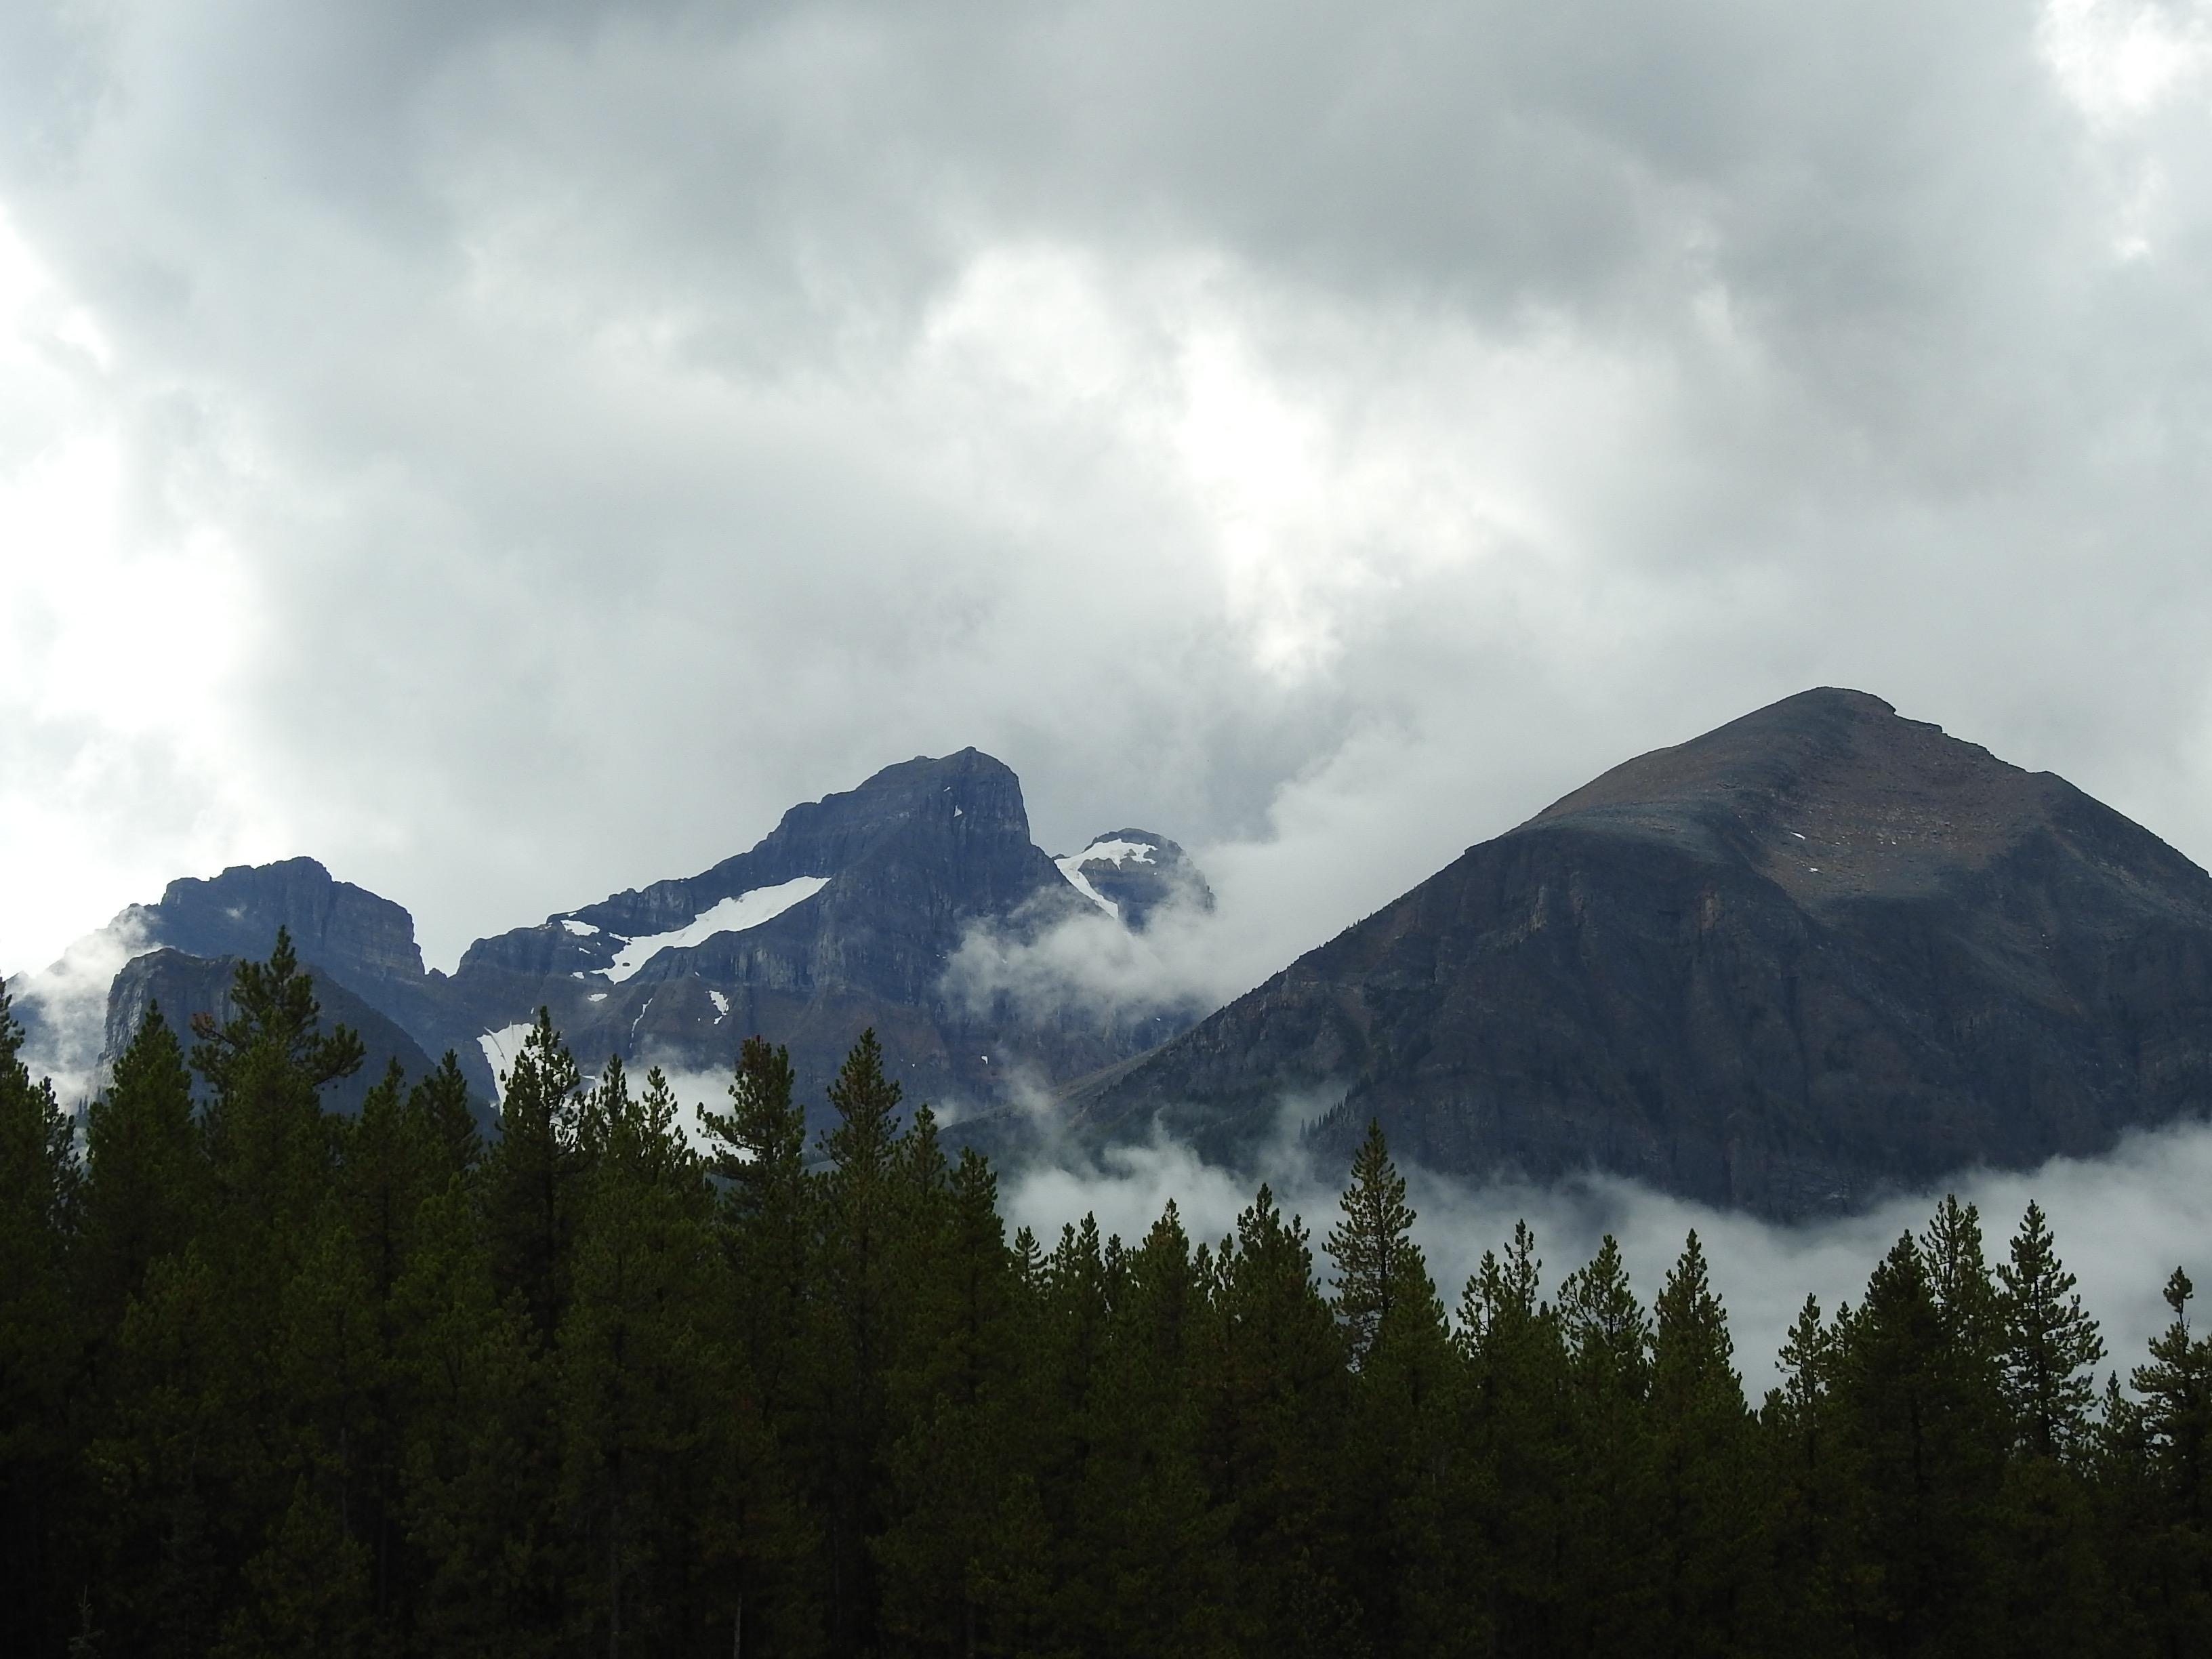 The Massive Mountain Range N of Banff